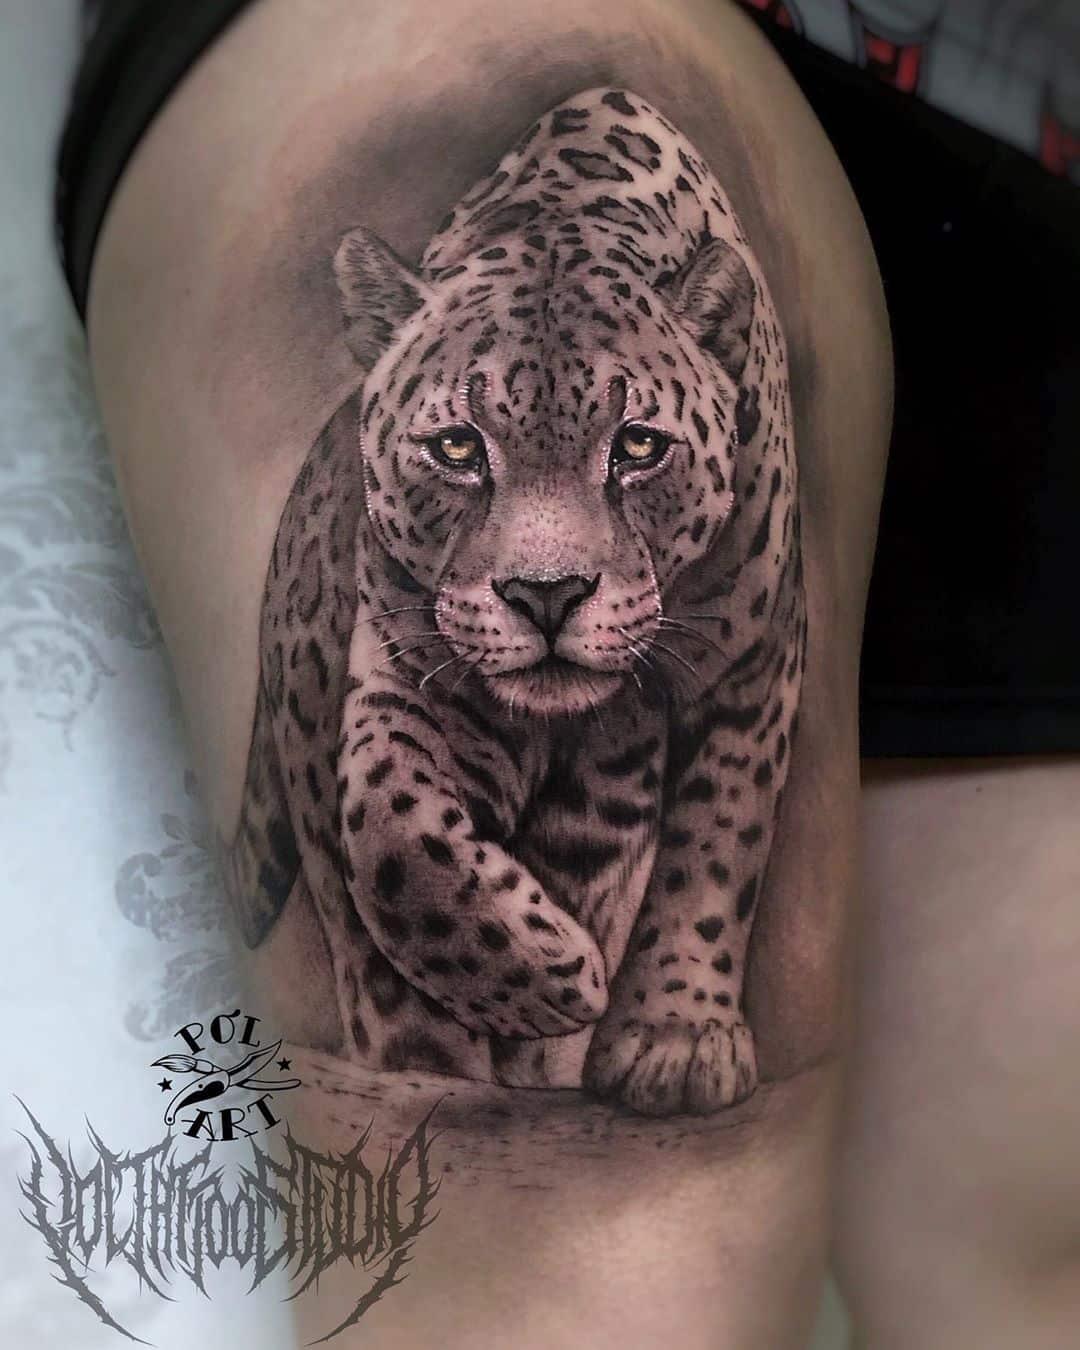 hyper-realistic-tattoo-style